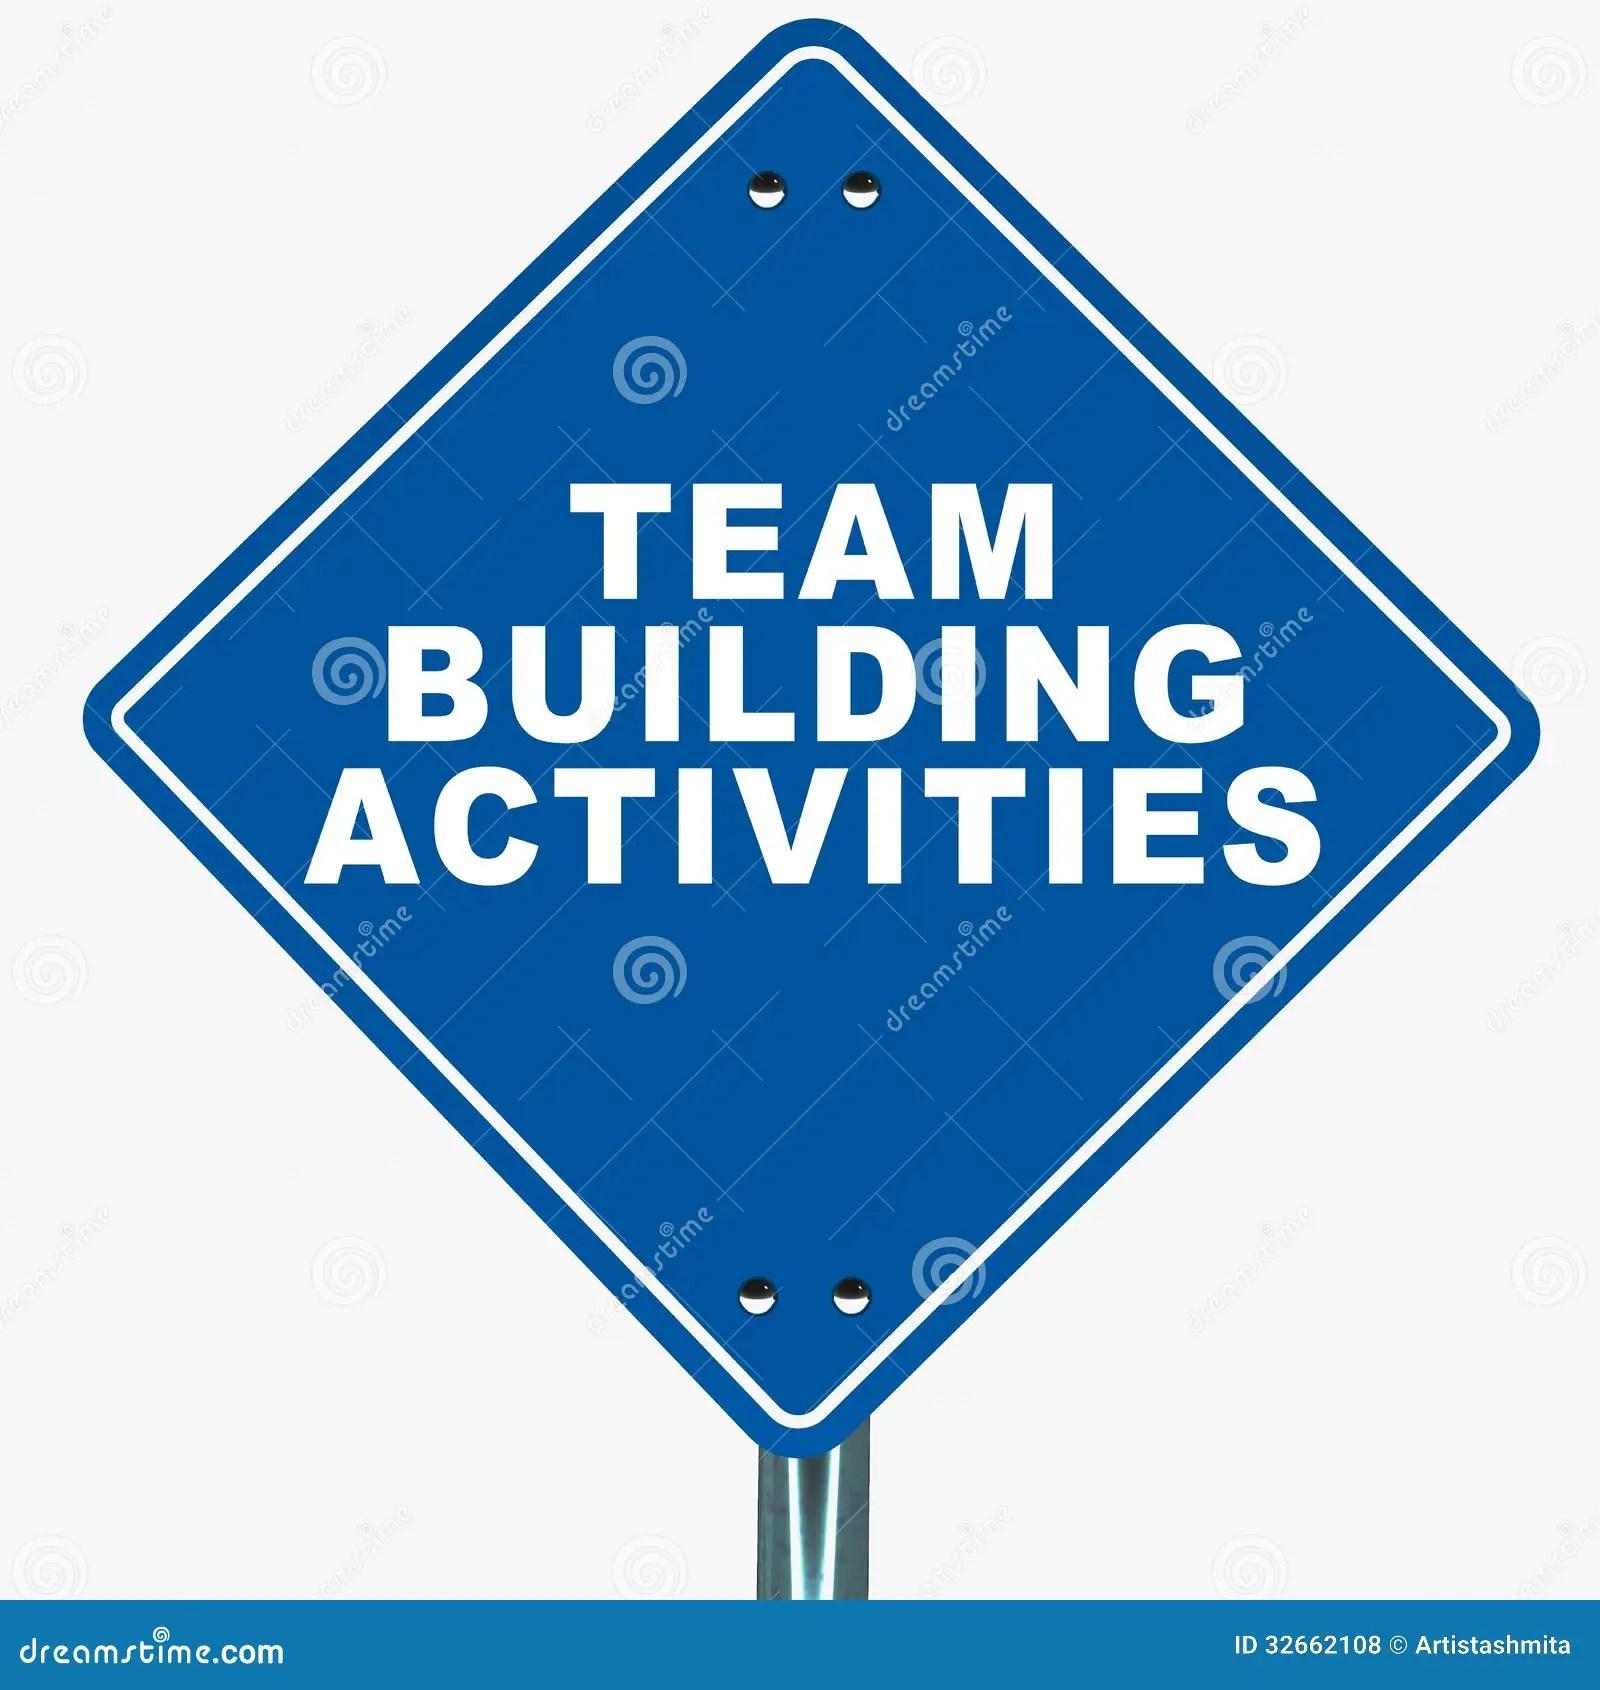 Team Building Activities Royalty Free Stock Photos